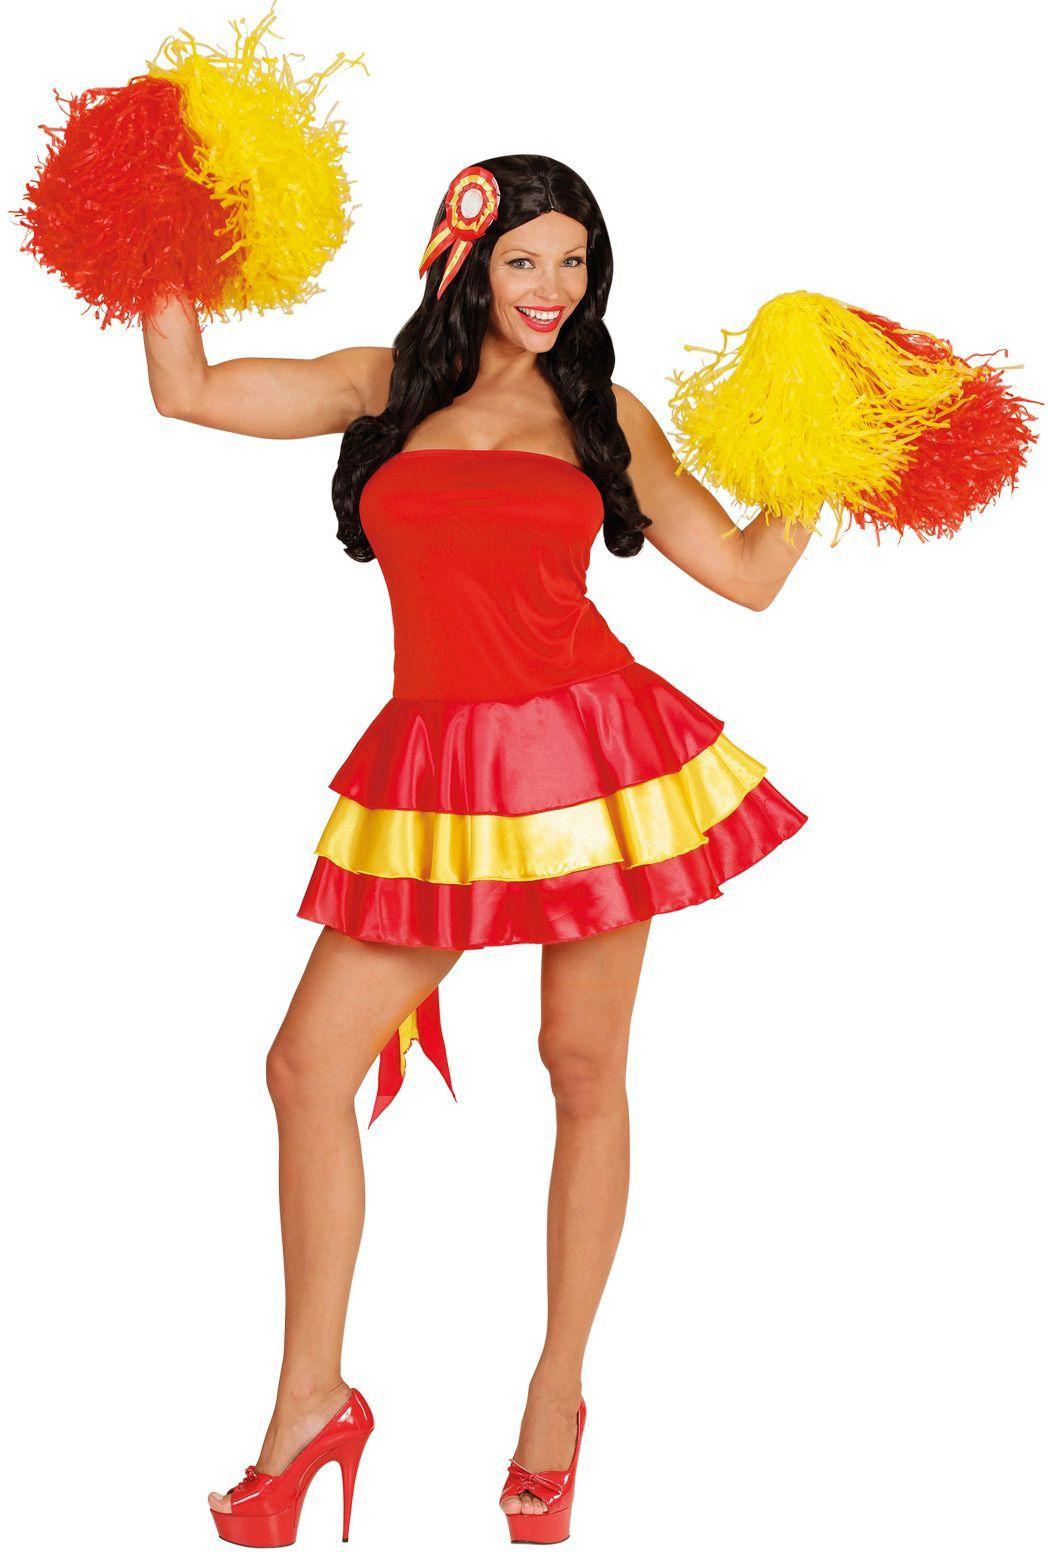 Spaans jurk met haarstukje